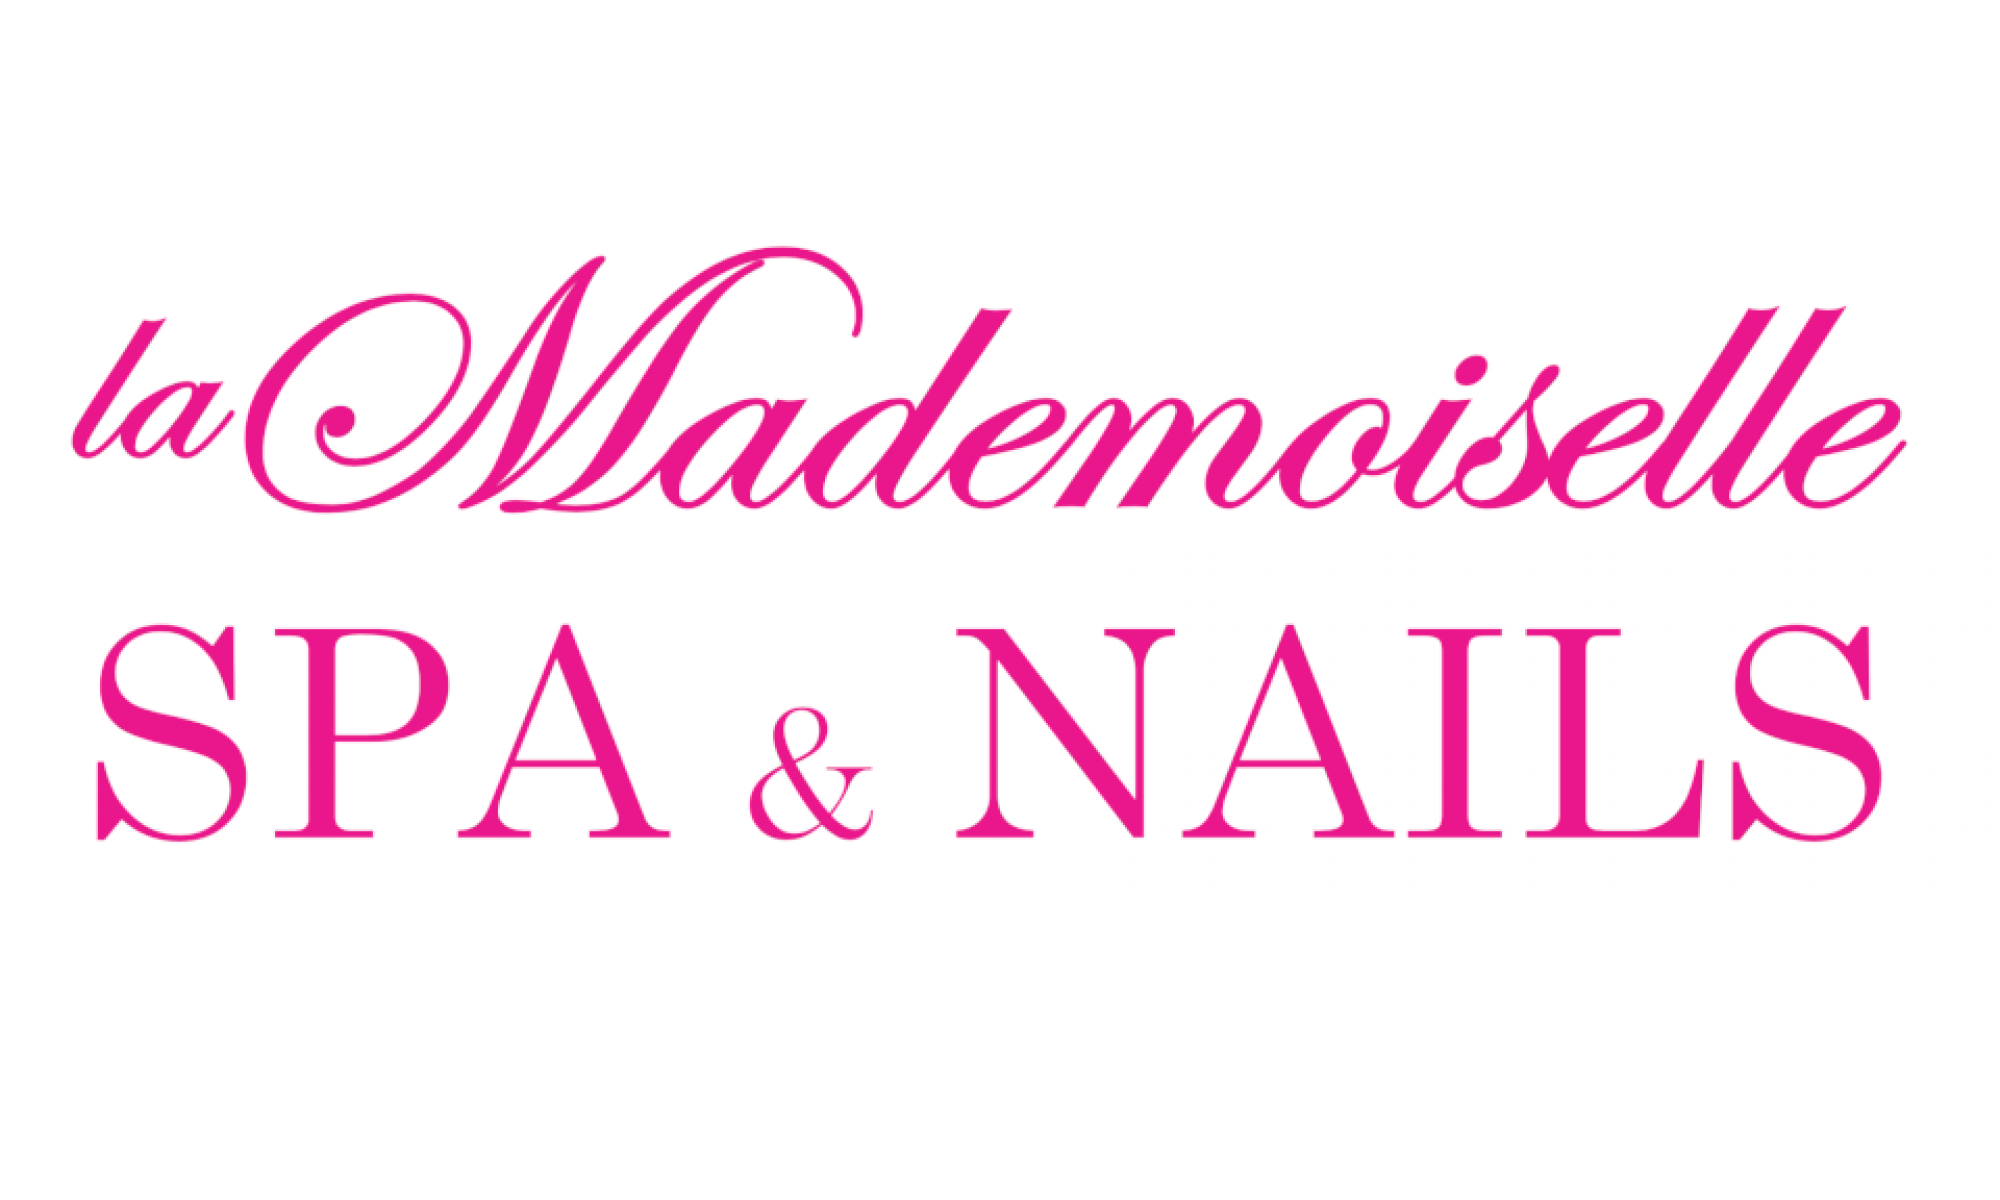 La Mademoiselle Nail and Spa